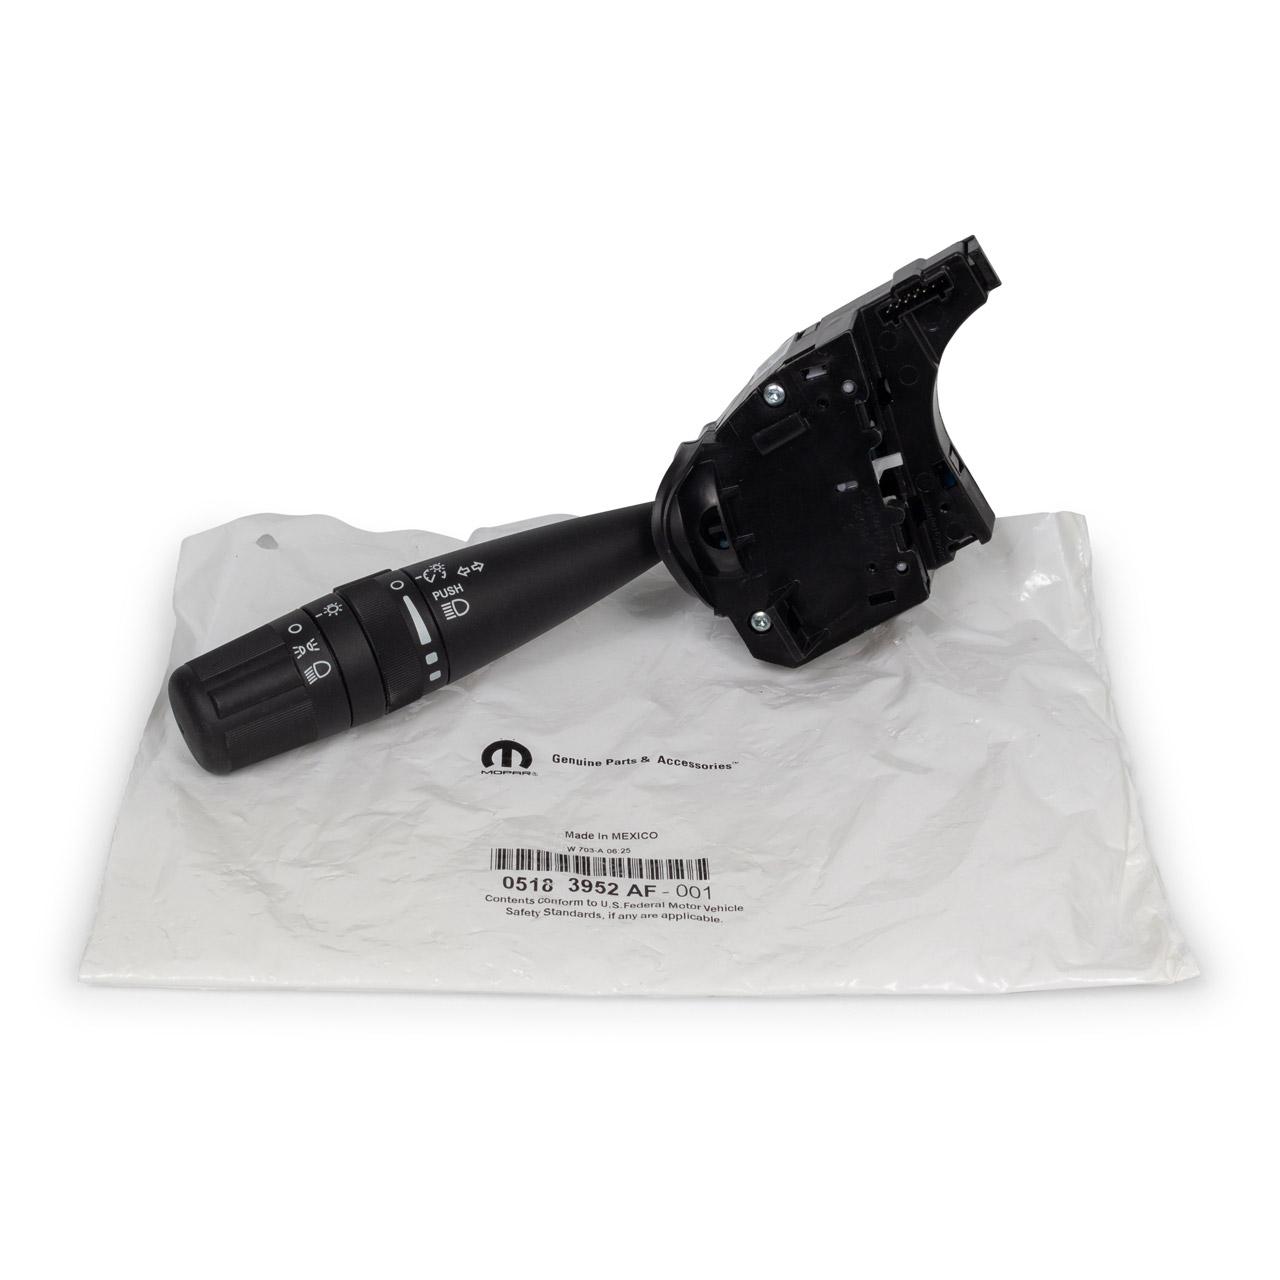 ORIGINAL MOPAR Lenkstockschalter Blinkerschalter DODGE JEEP CHEROKEE 05183952AF